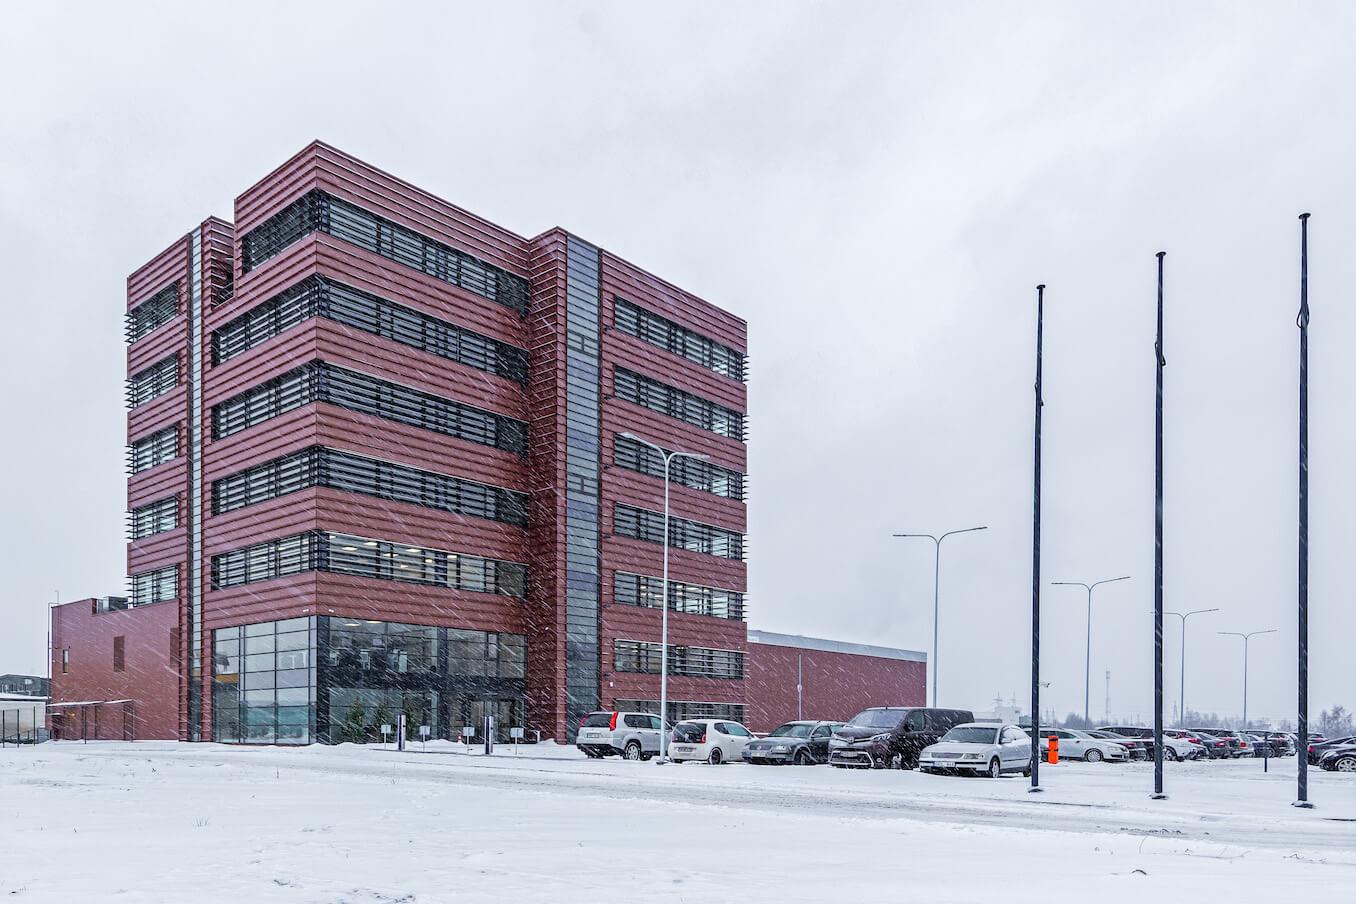 verslo-centras-inovaciju3-architektura